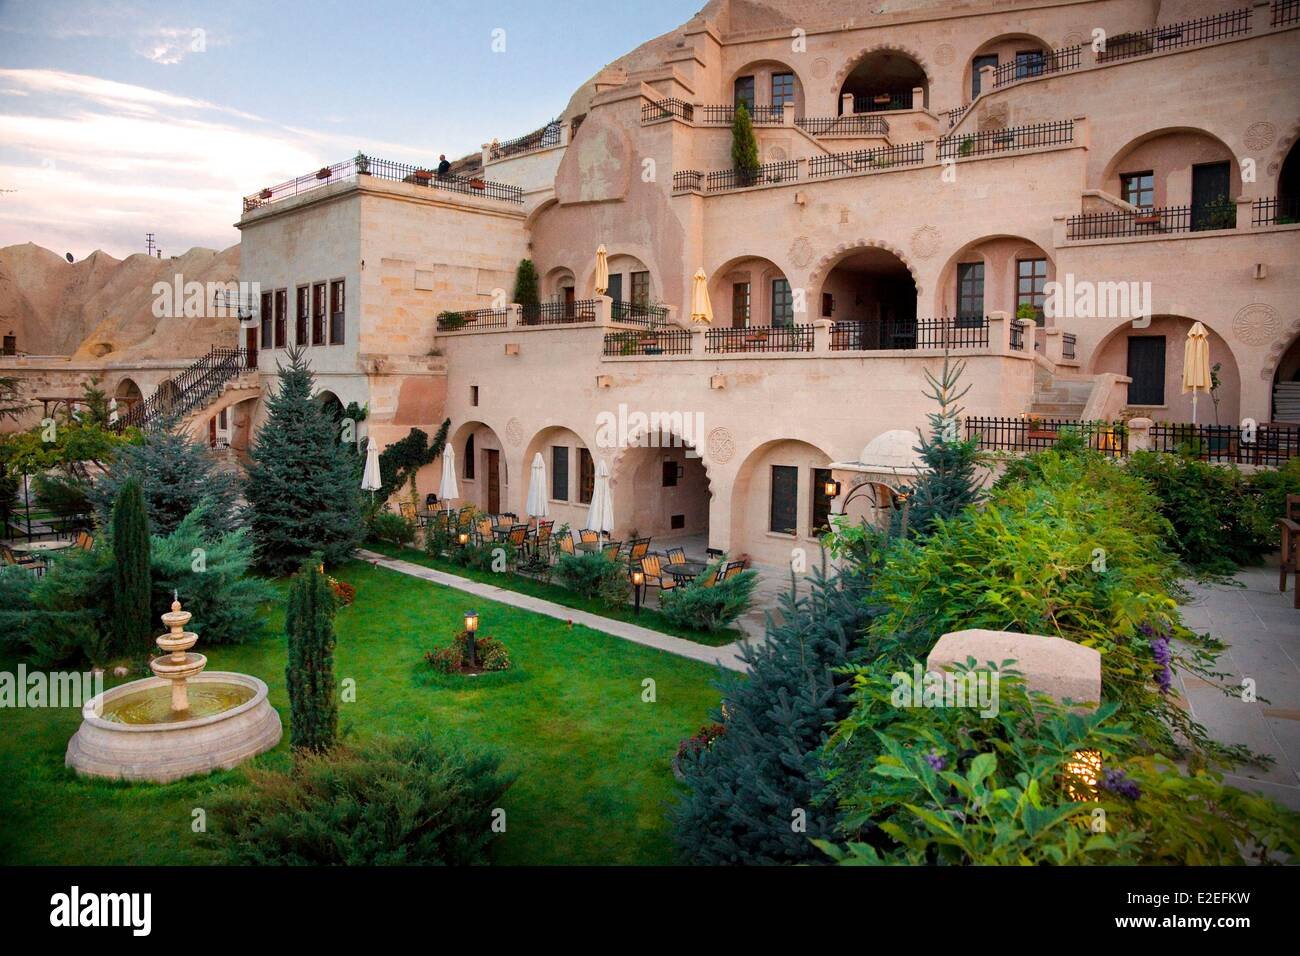 Turkey, Central Anatolia, Capadoccia, Urgup, Alfina Cave Hotel - Stock Image